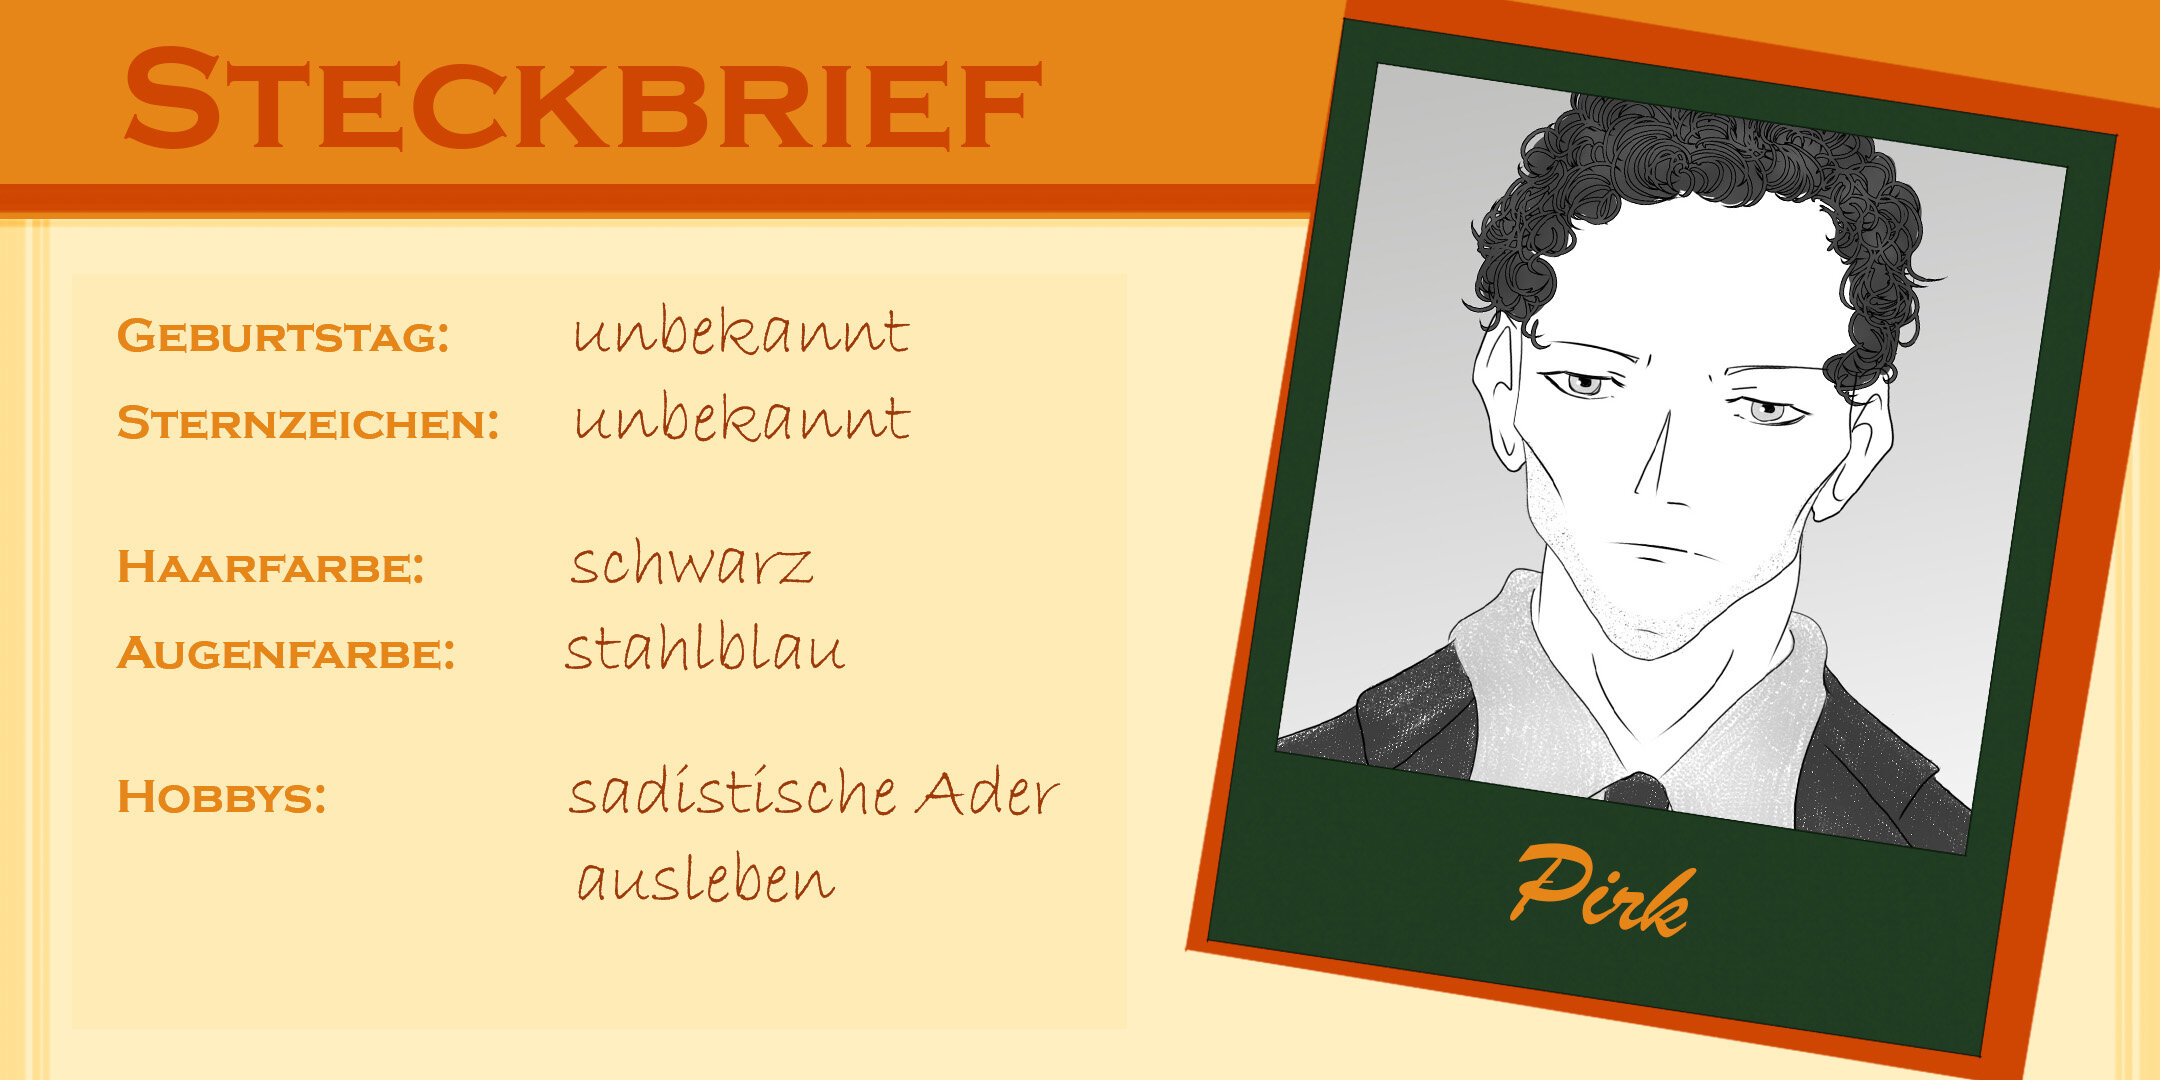 Steckbrief Pirk